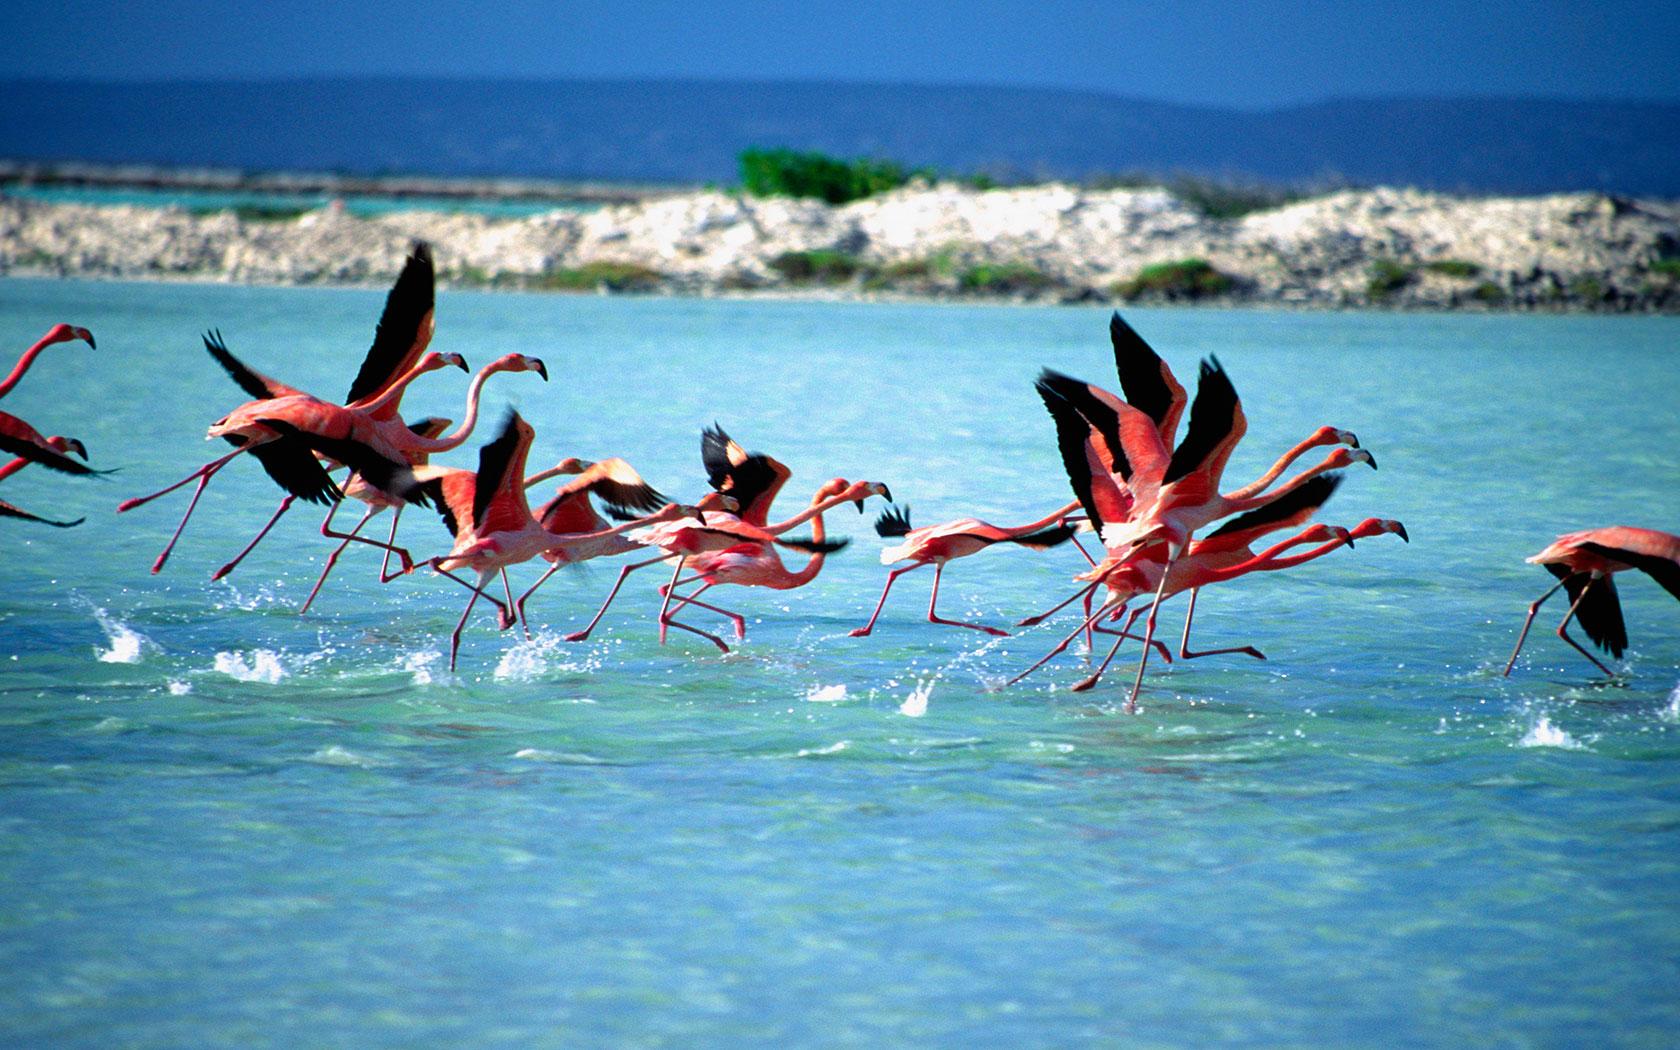 Wilde flamingo's spotten